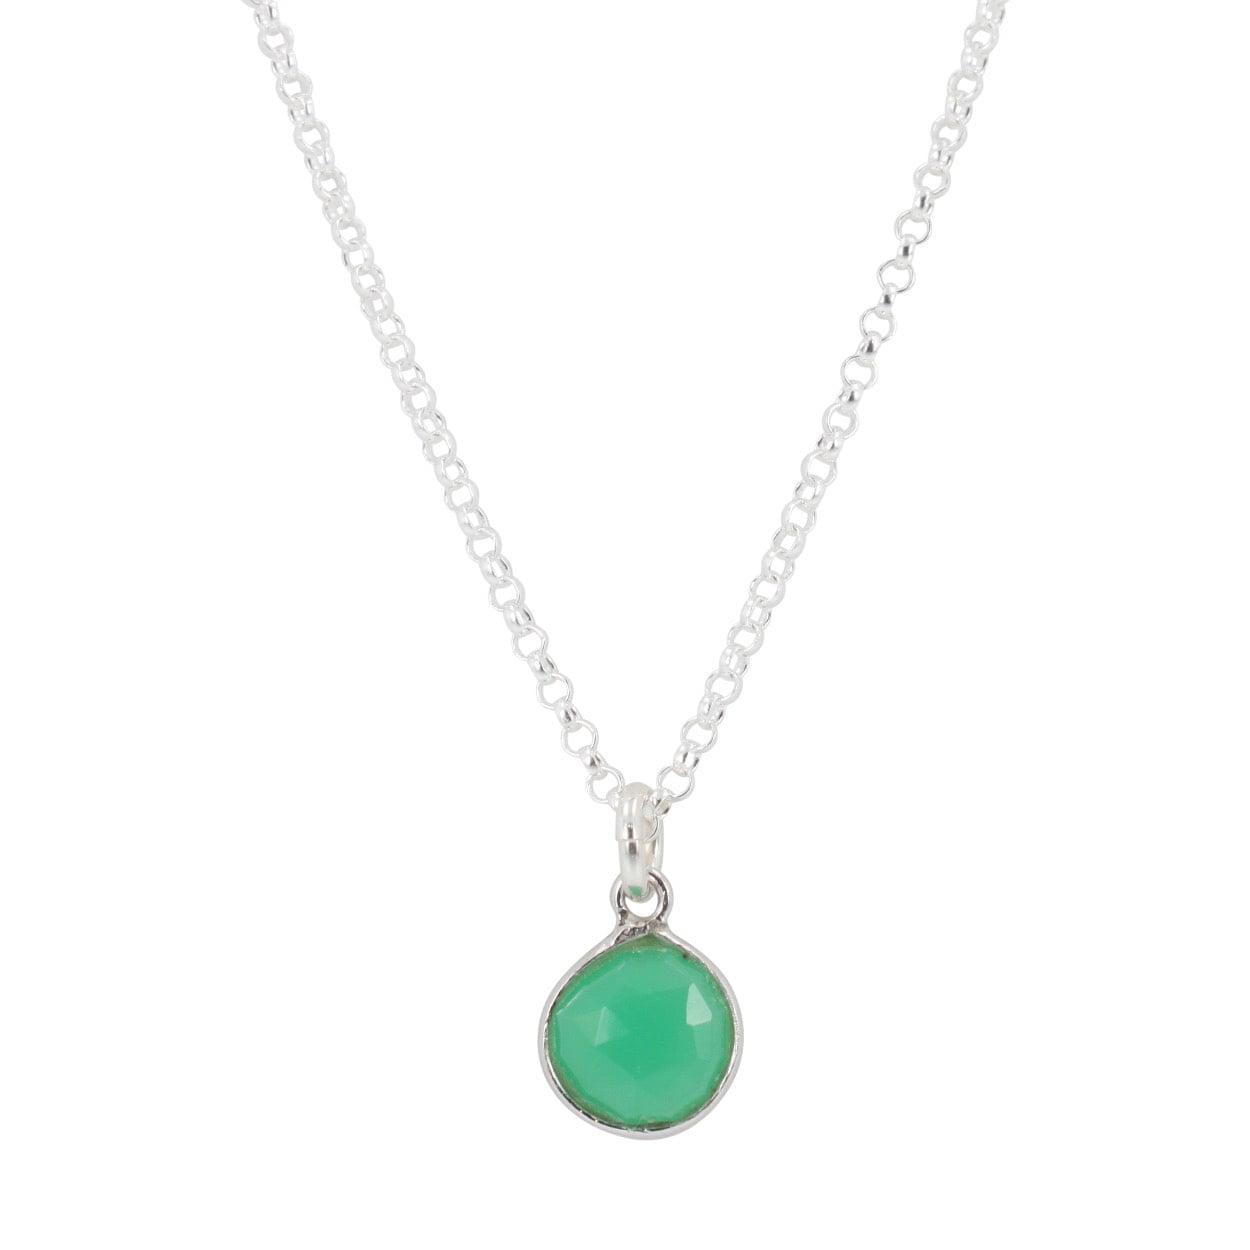 Silver Gemstone Necklace, #6300-ss (Chrysoprase) by